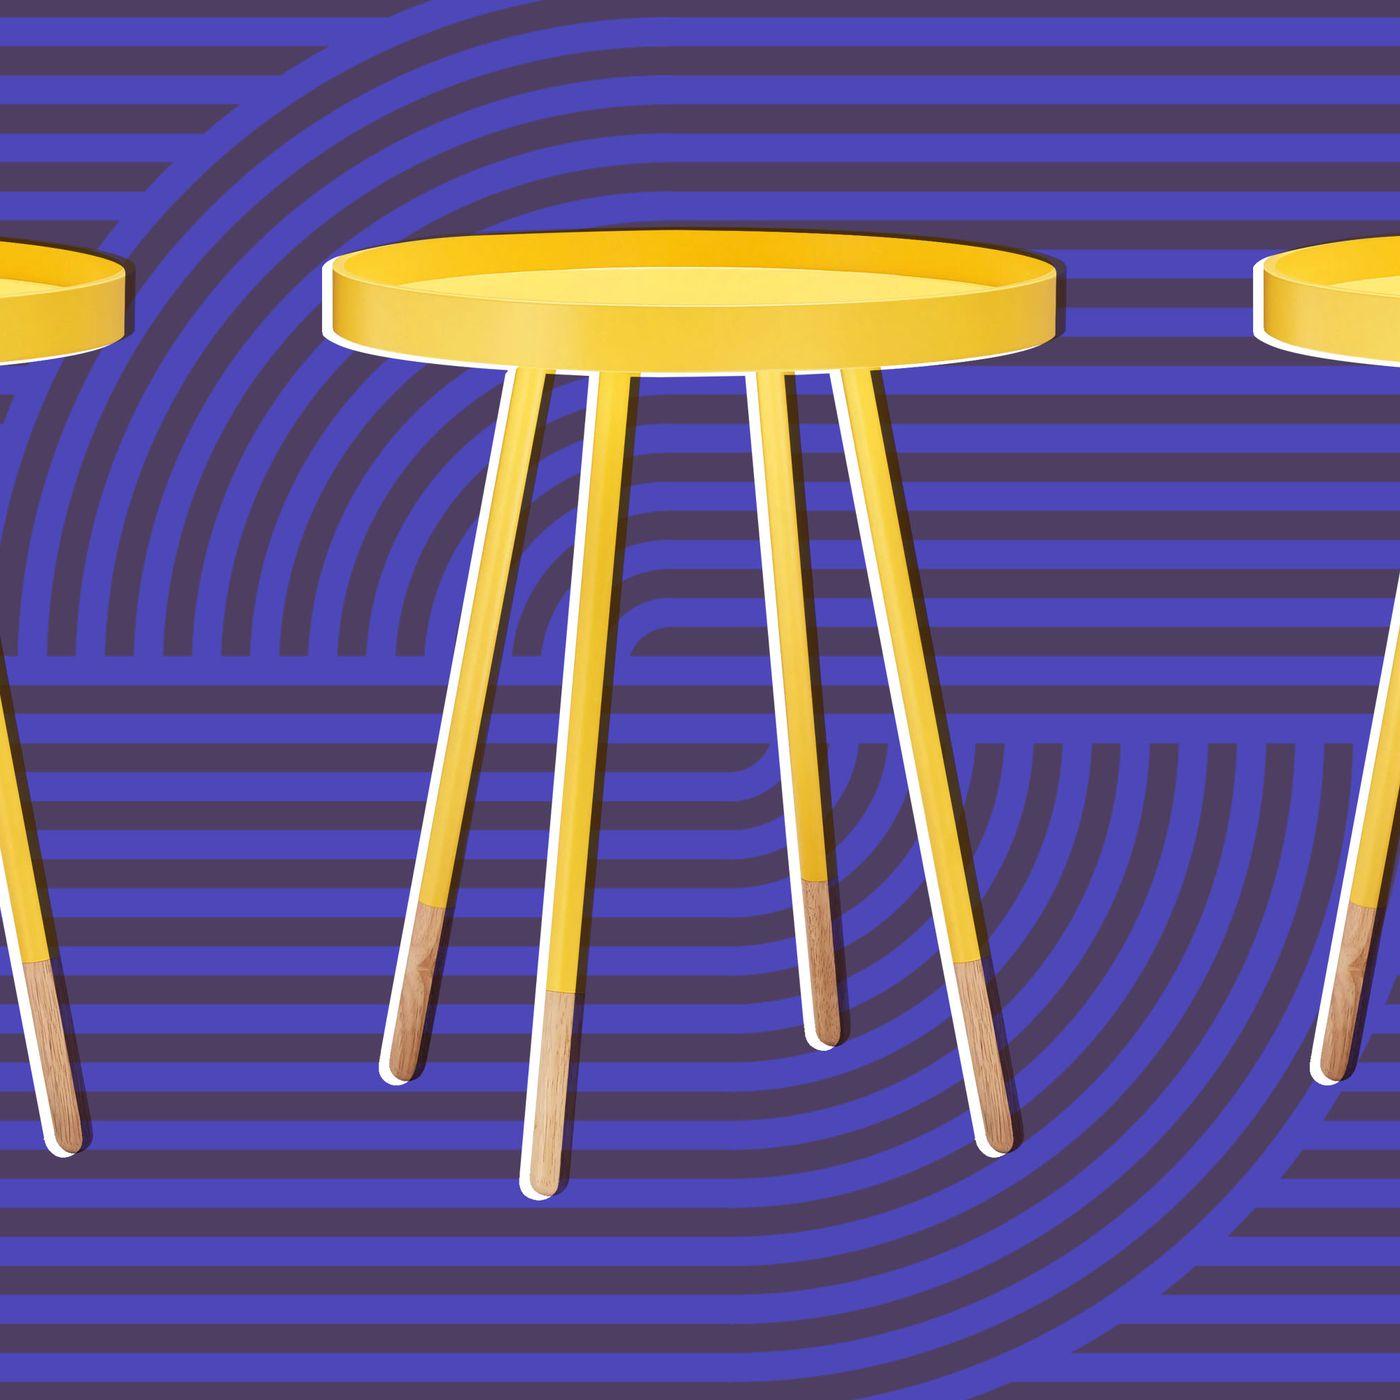 Admirable Wayfair Cyber Monday 2019 Deals Furniture And Home Decor To Inzonedesignstudio Interior Chair Design Inzonedesignstudiocom